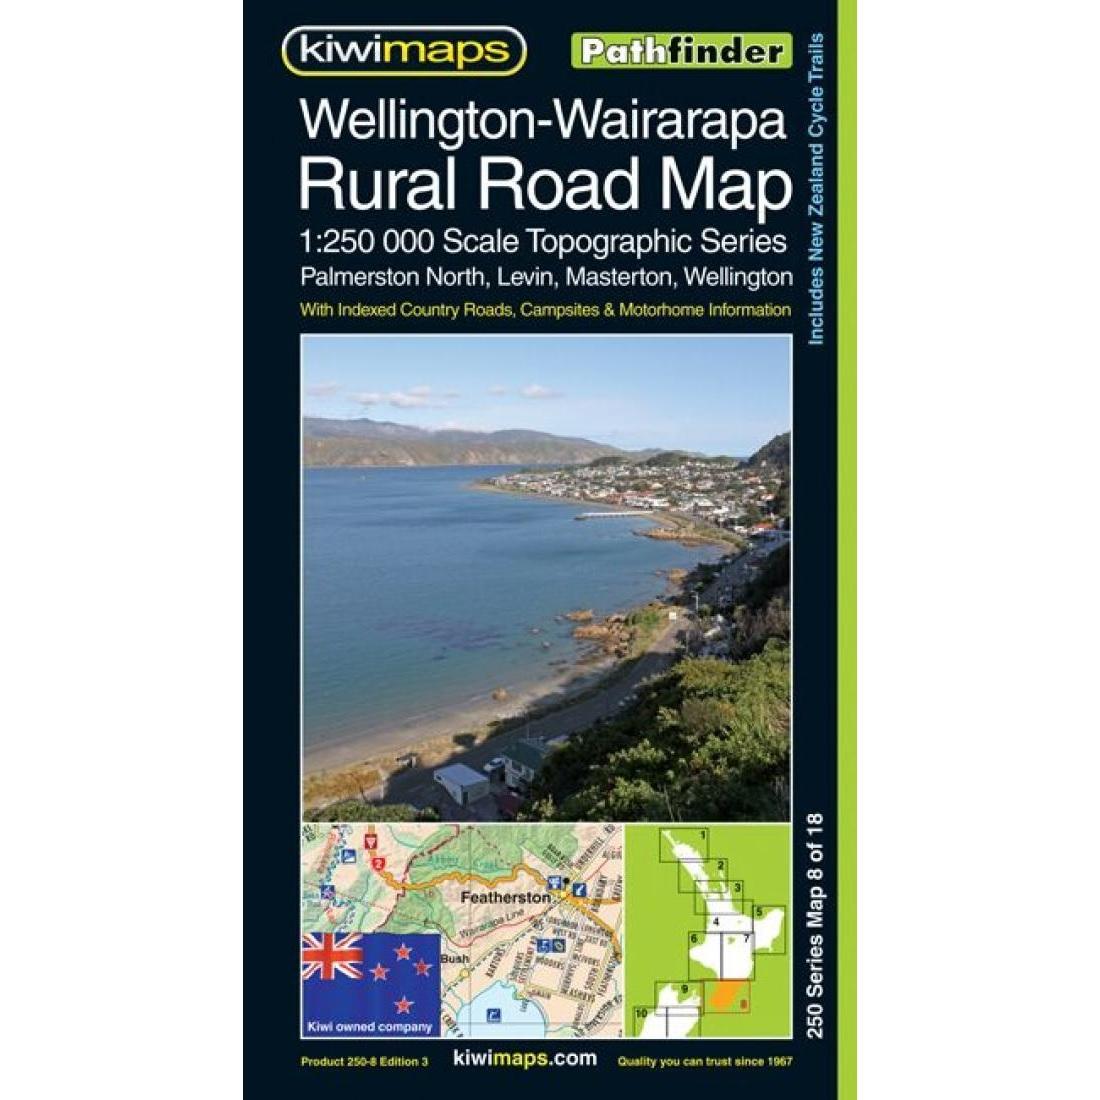 Wairarapa New Zealand Map.Wellington Wairarapa Rural Road Map